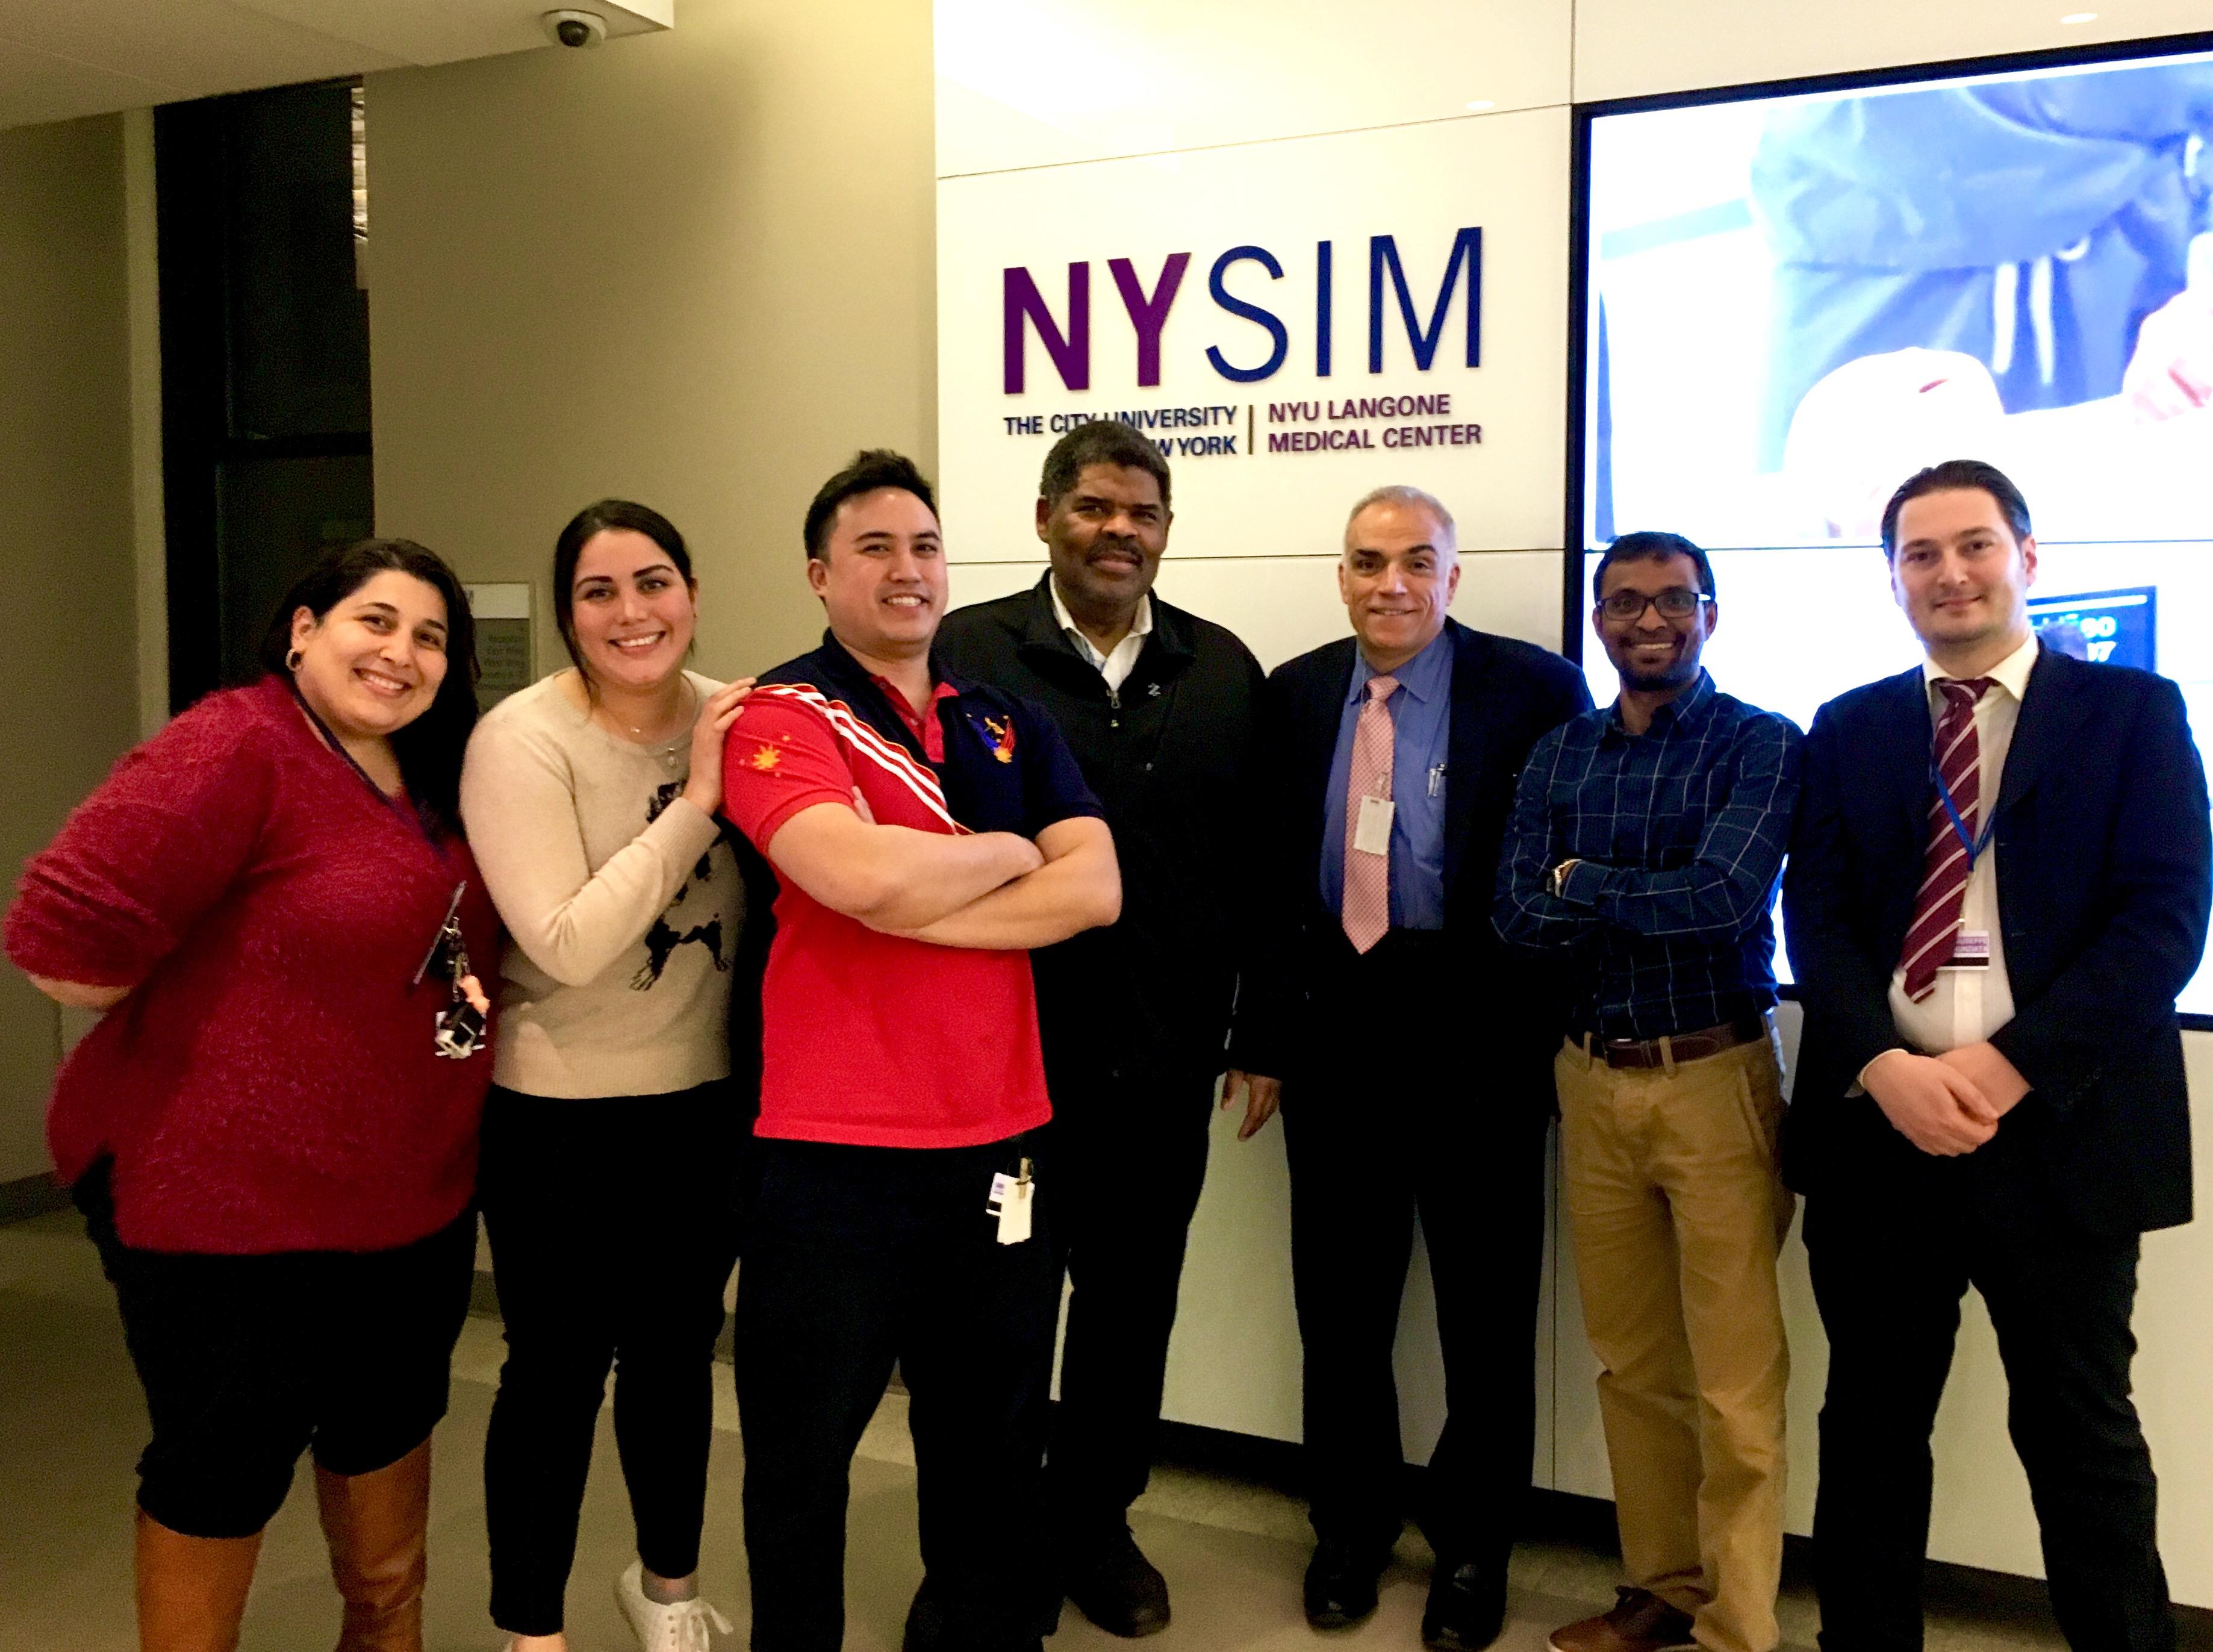 Images of NYSIM training center